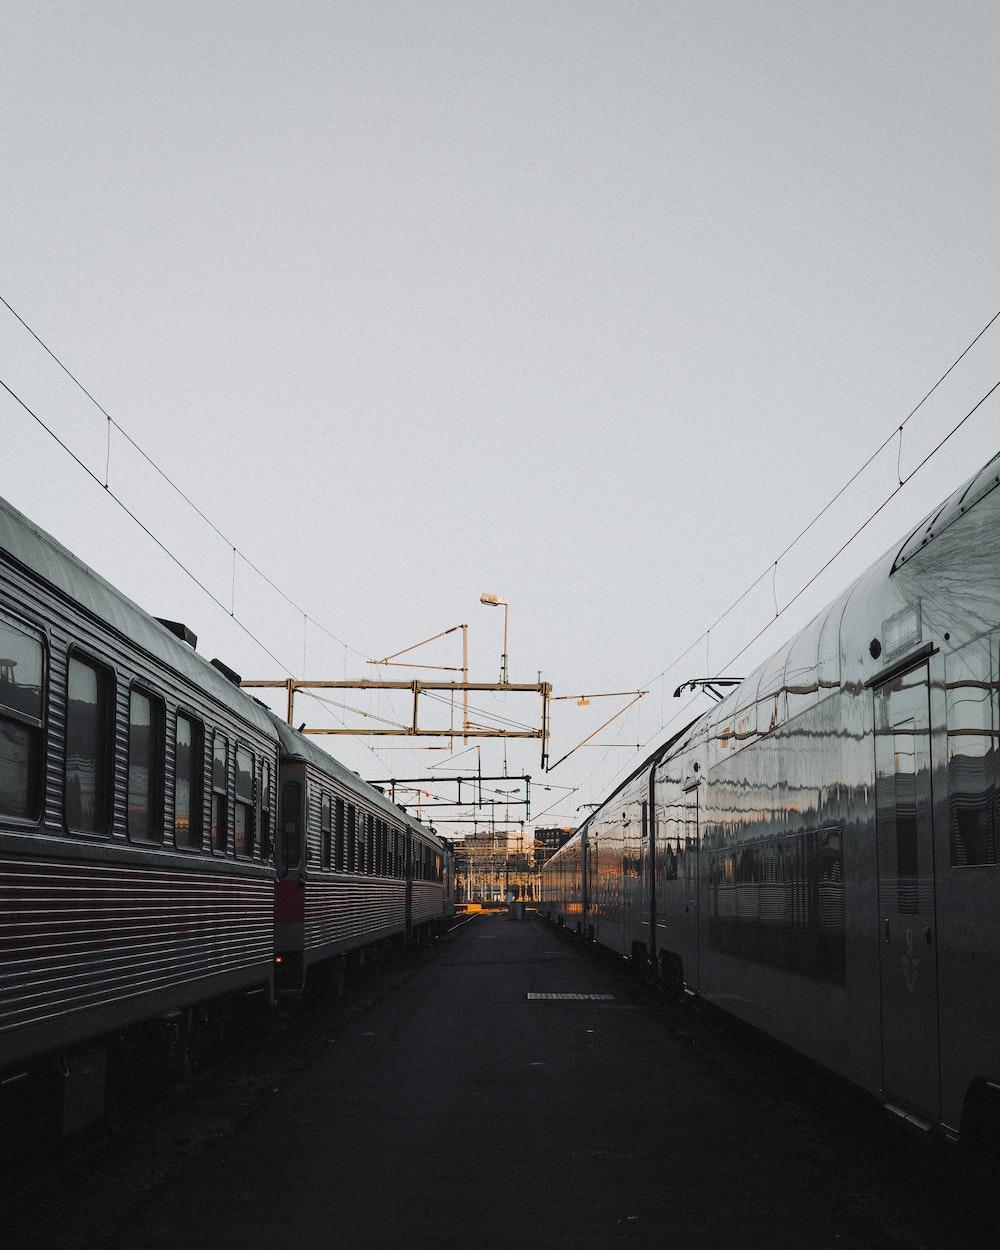 two gray passenger trains